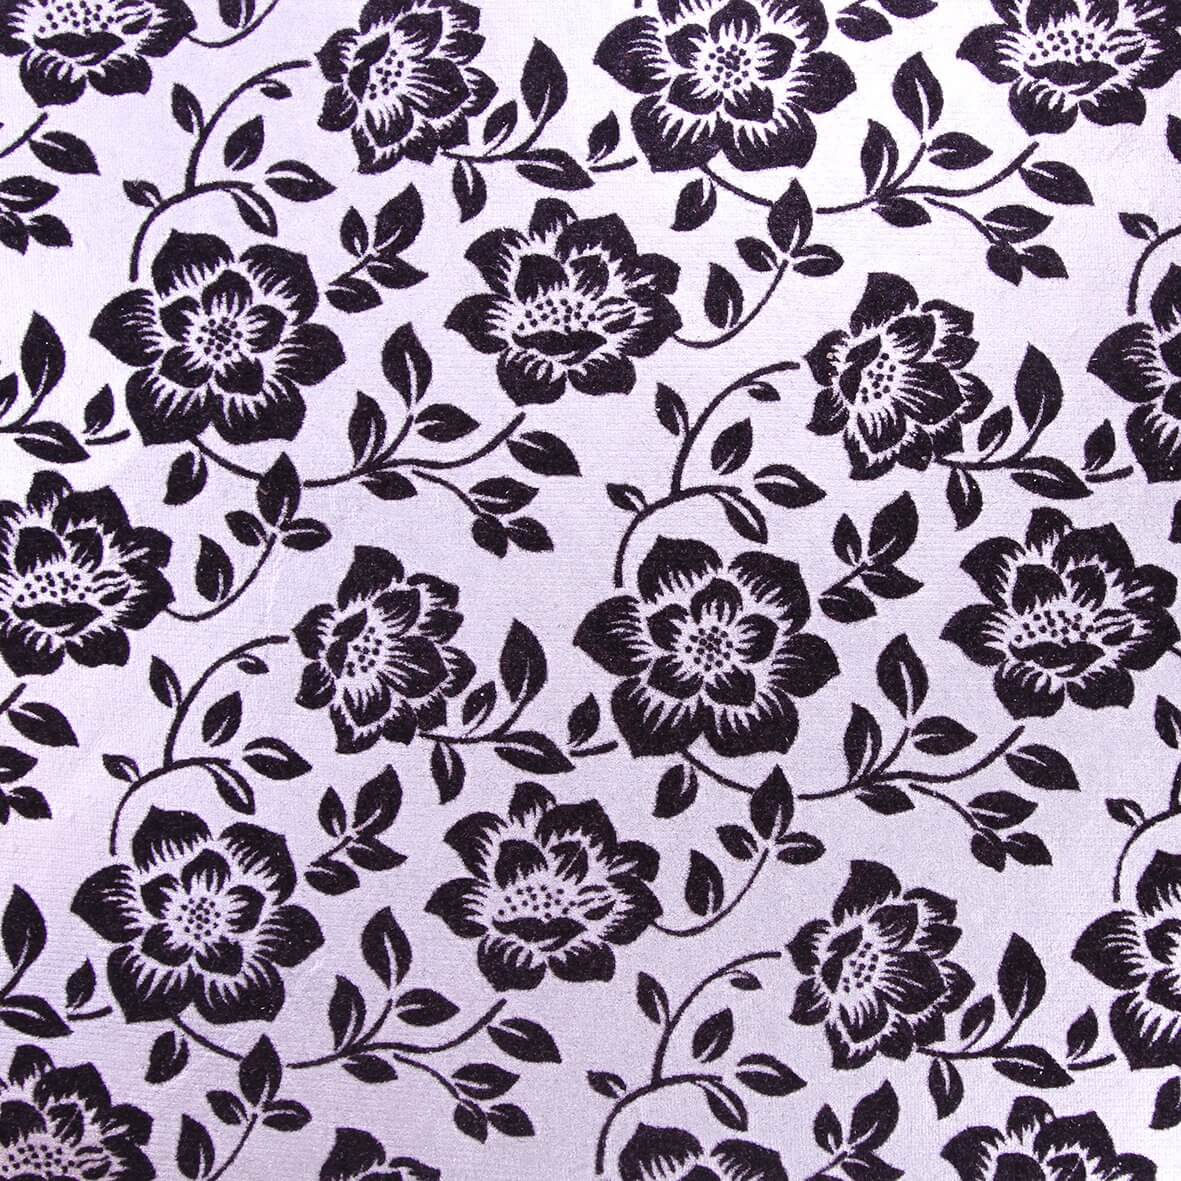 The Adlington (Black on Silver) A4 Flocked Paper